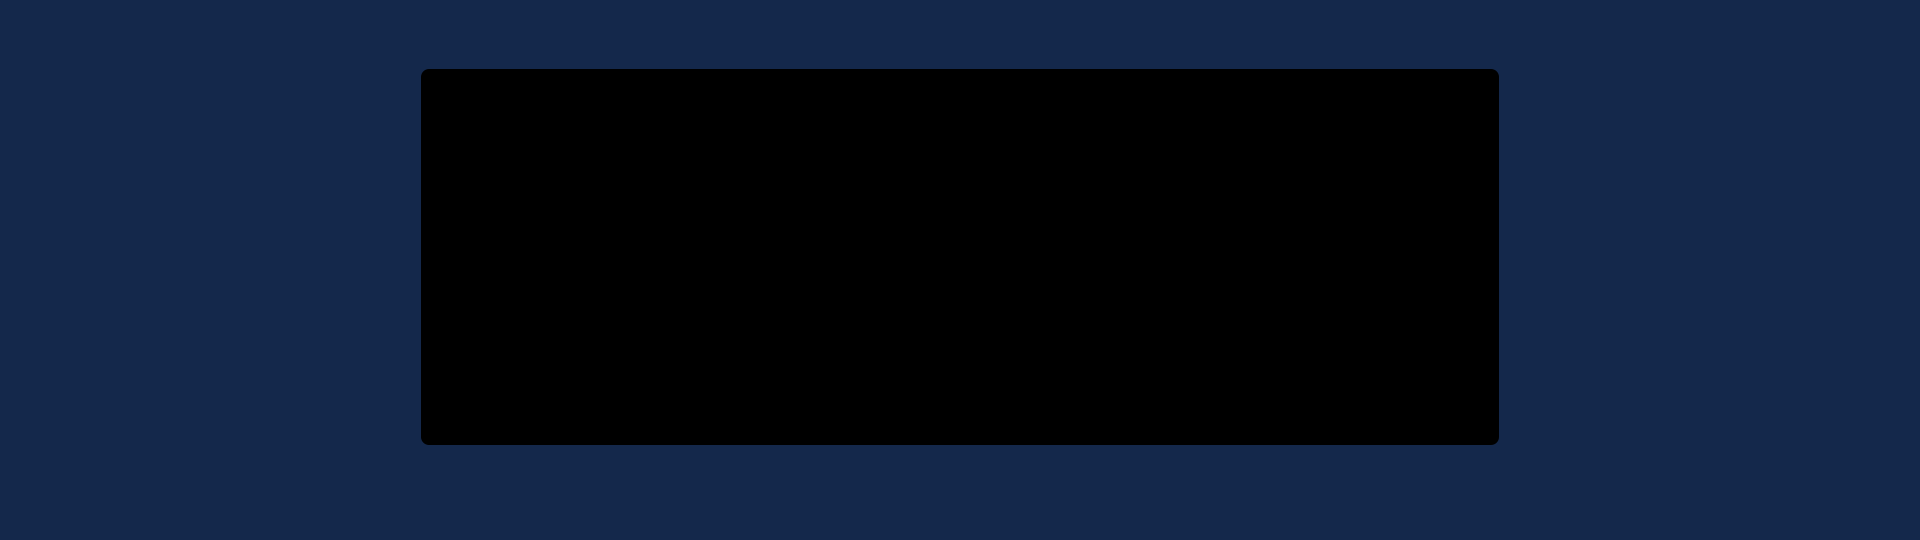 CATEGORY-GIYIM-COCUKUSPOLOSEPETTE20INDIRIM-20-02